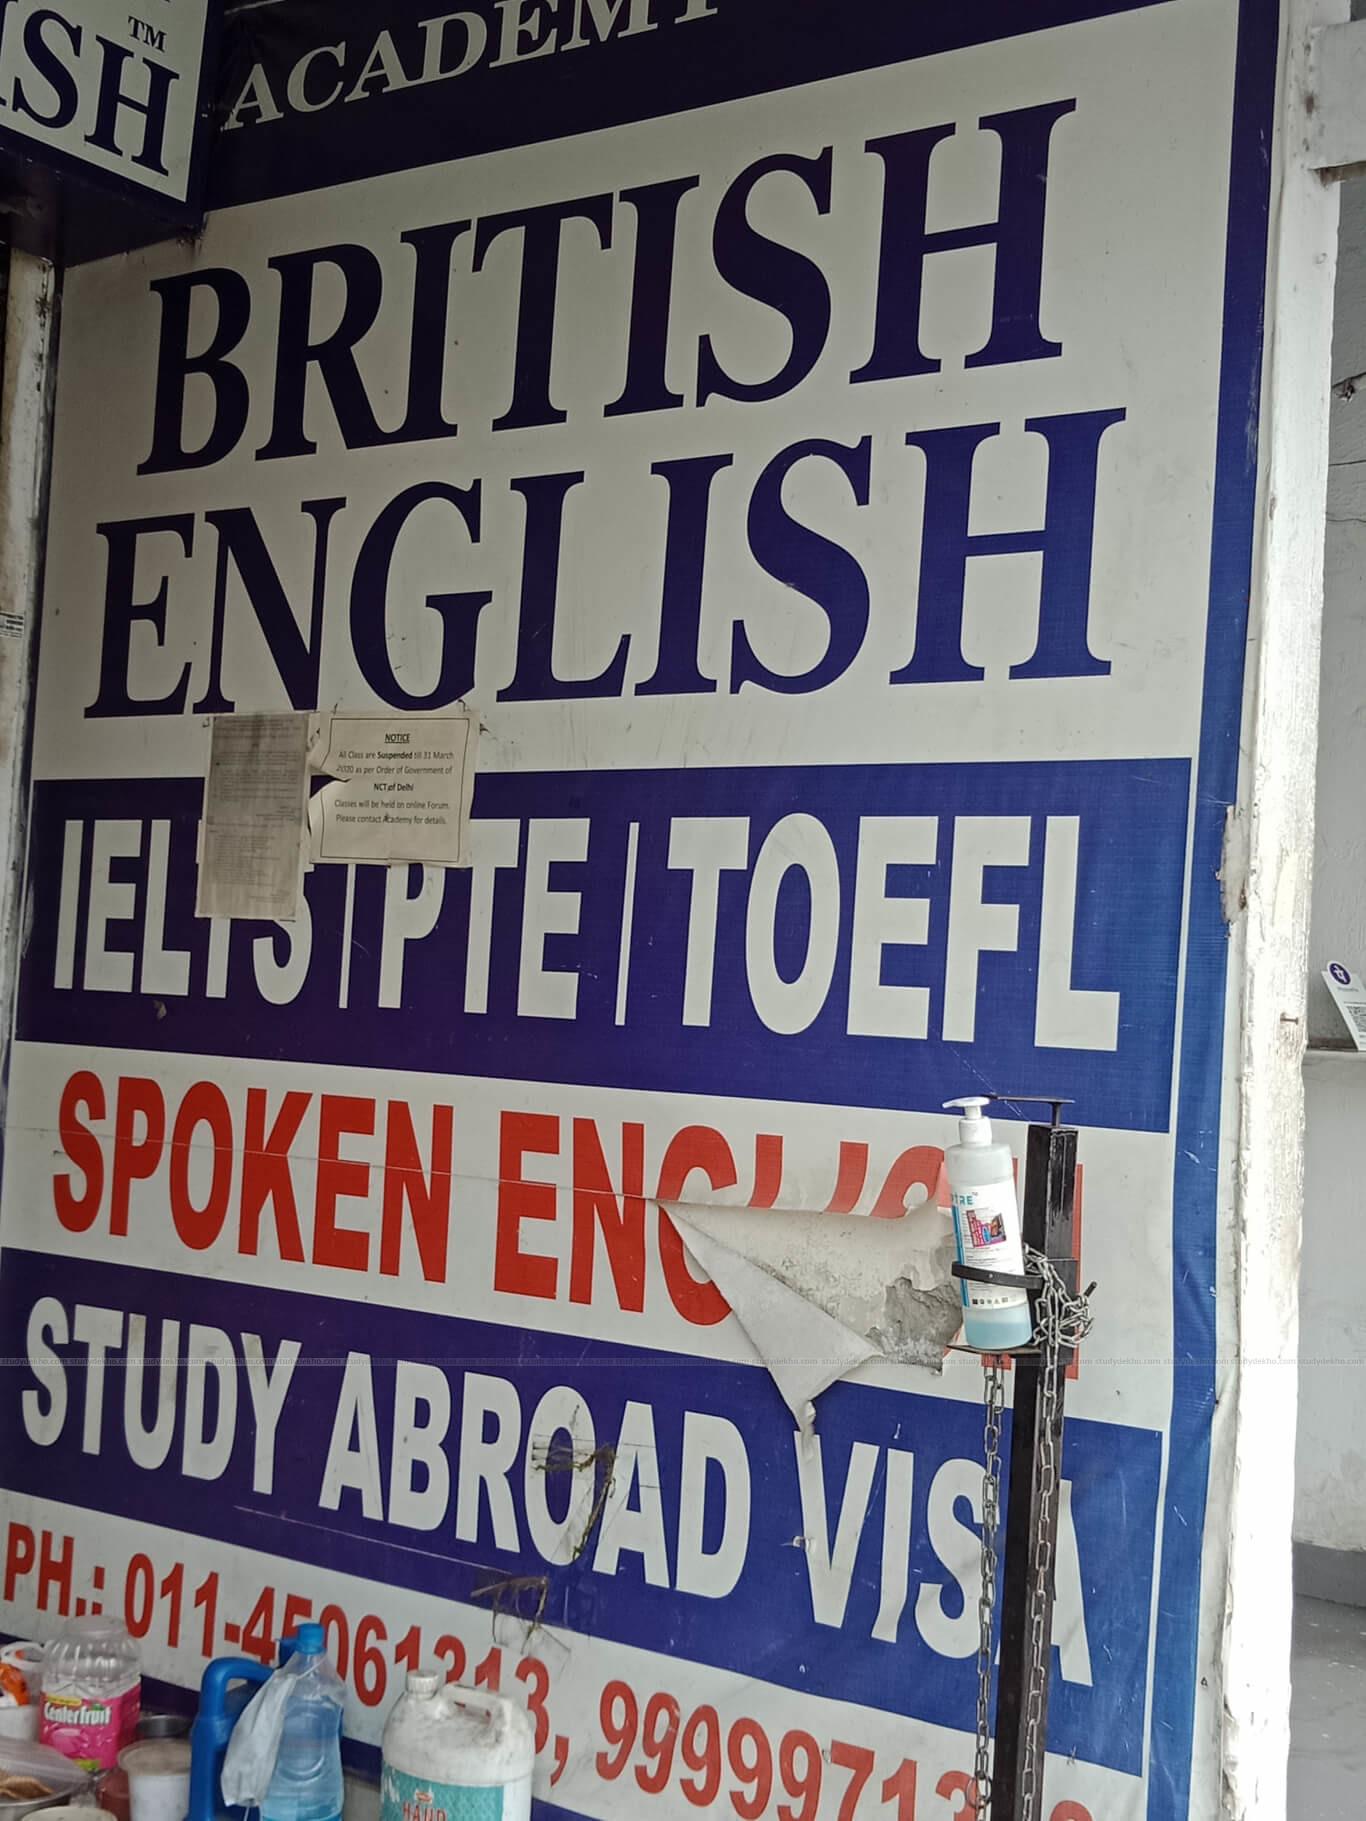 ACADEMY OF BRITISH ENGLISH Gallery